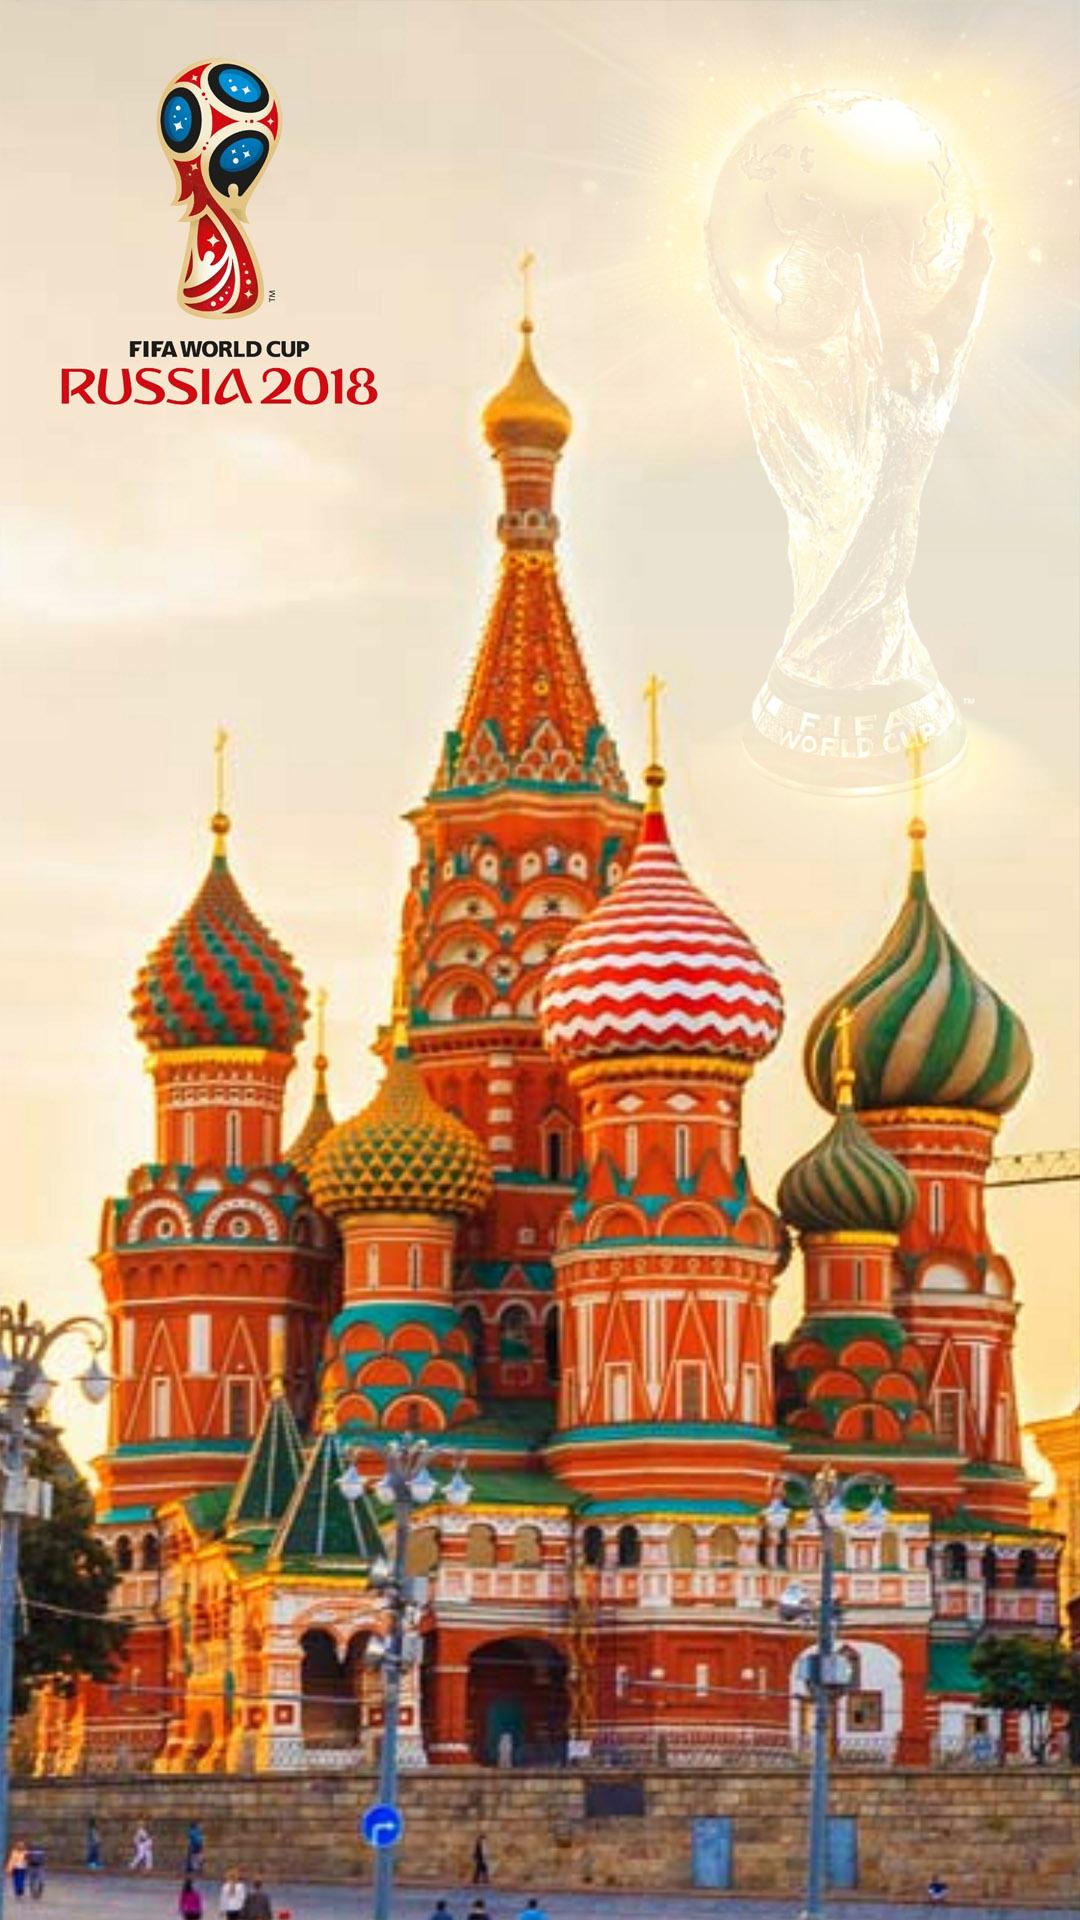 Download russia fifa world cup 2018 free pure 4k ultra hd mobile wallpaper - 4k wallpaper russia ...